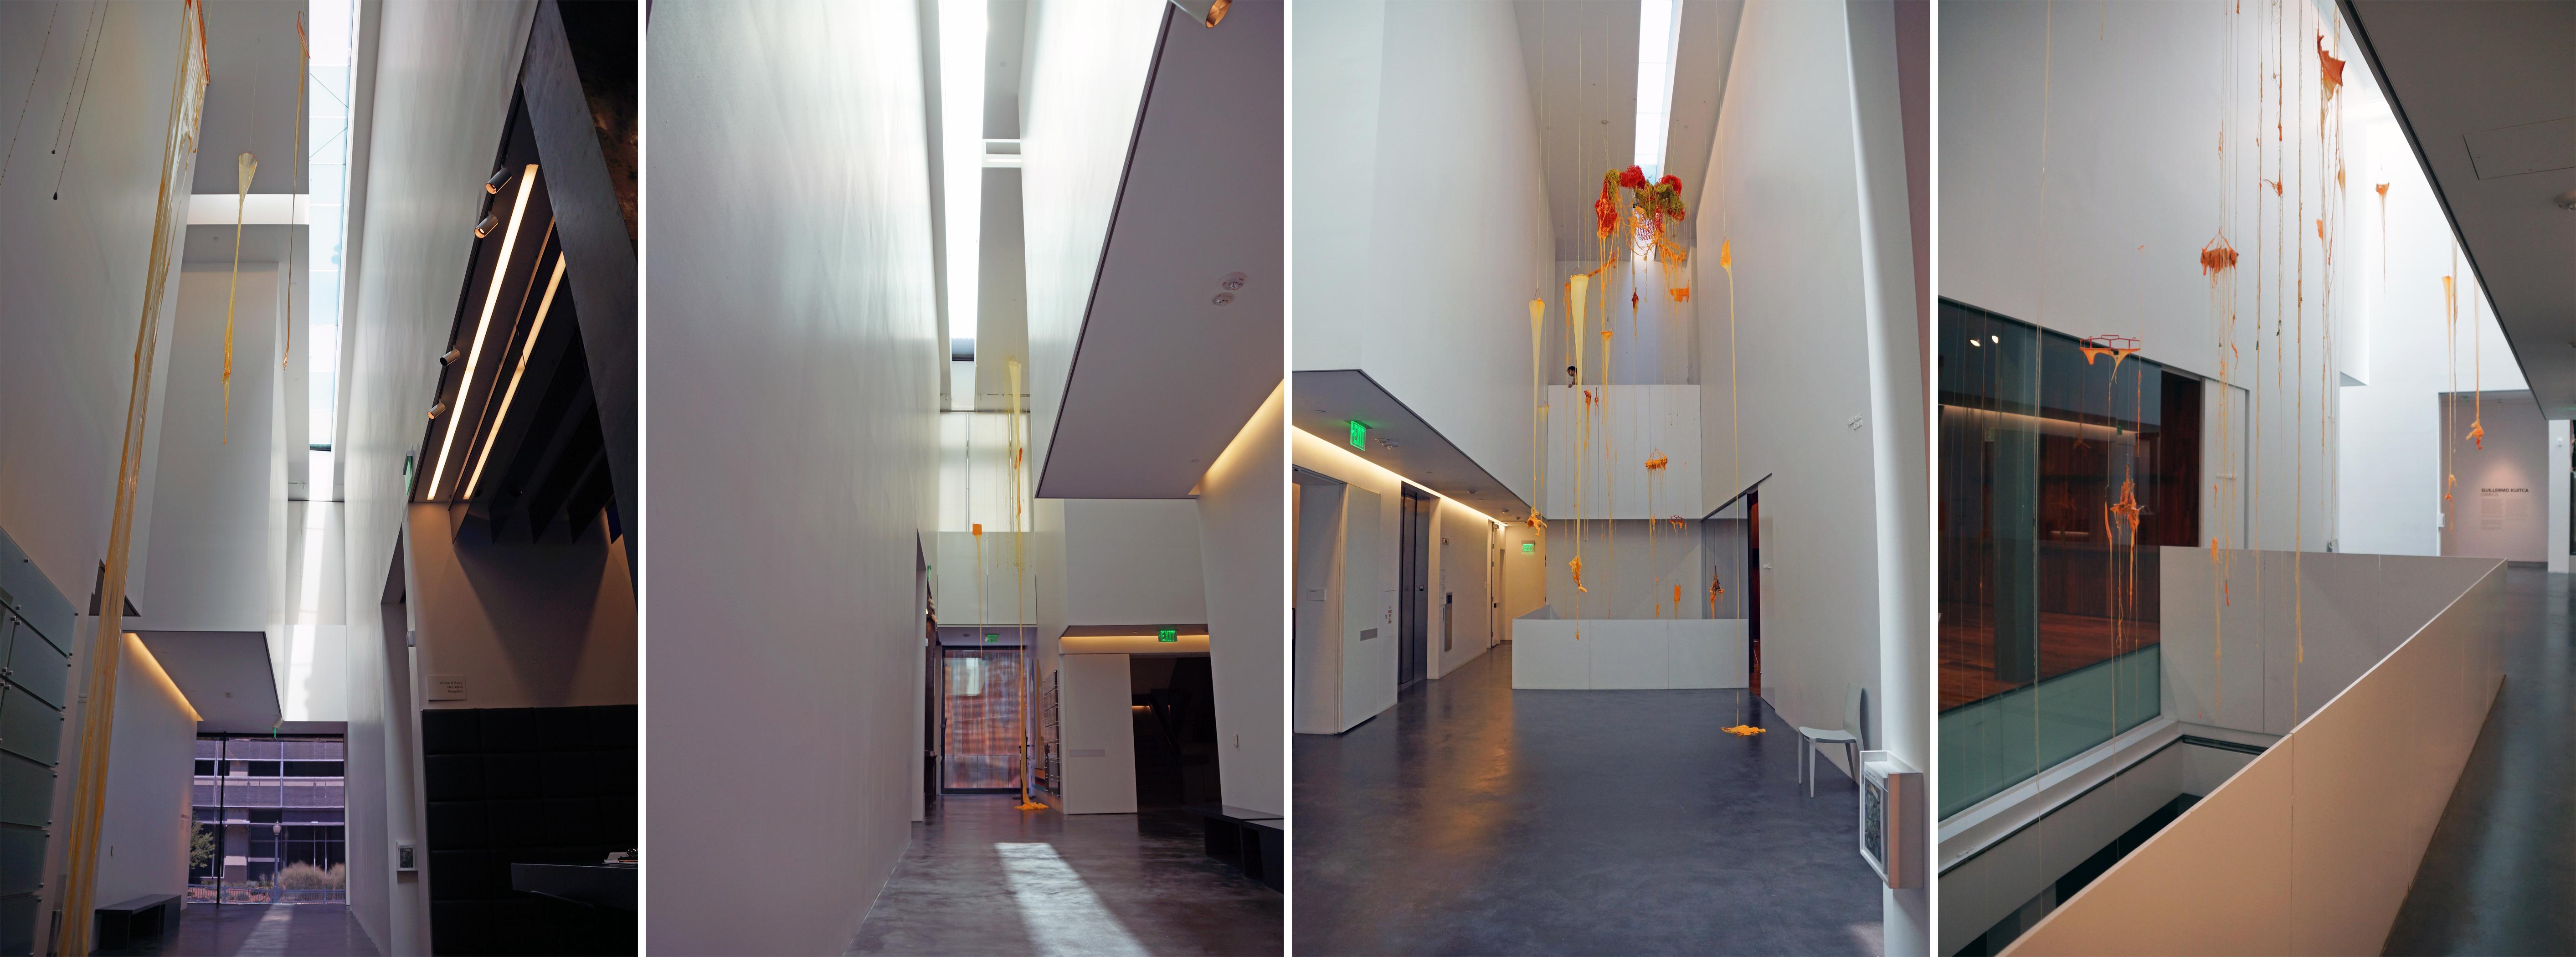 denver home creative designer interior showroom metropolitan blake consultants large floors kreel design